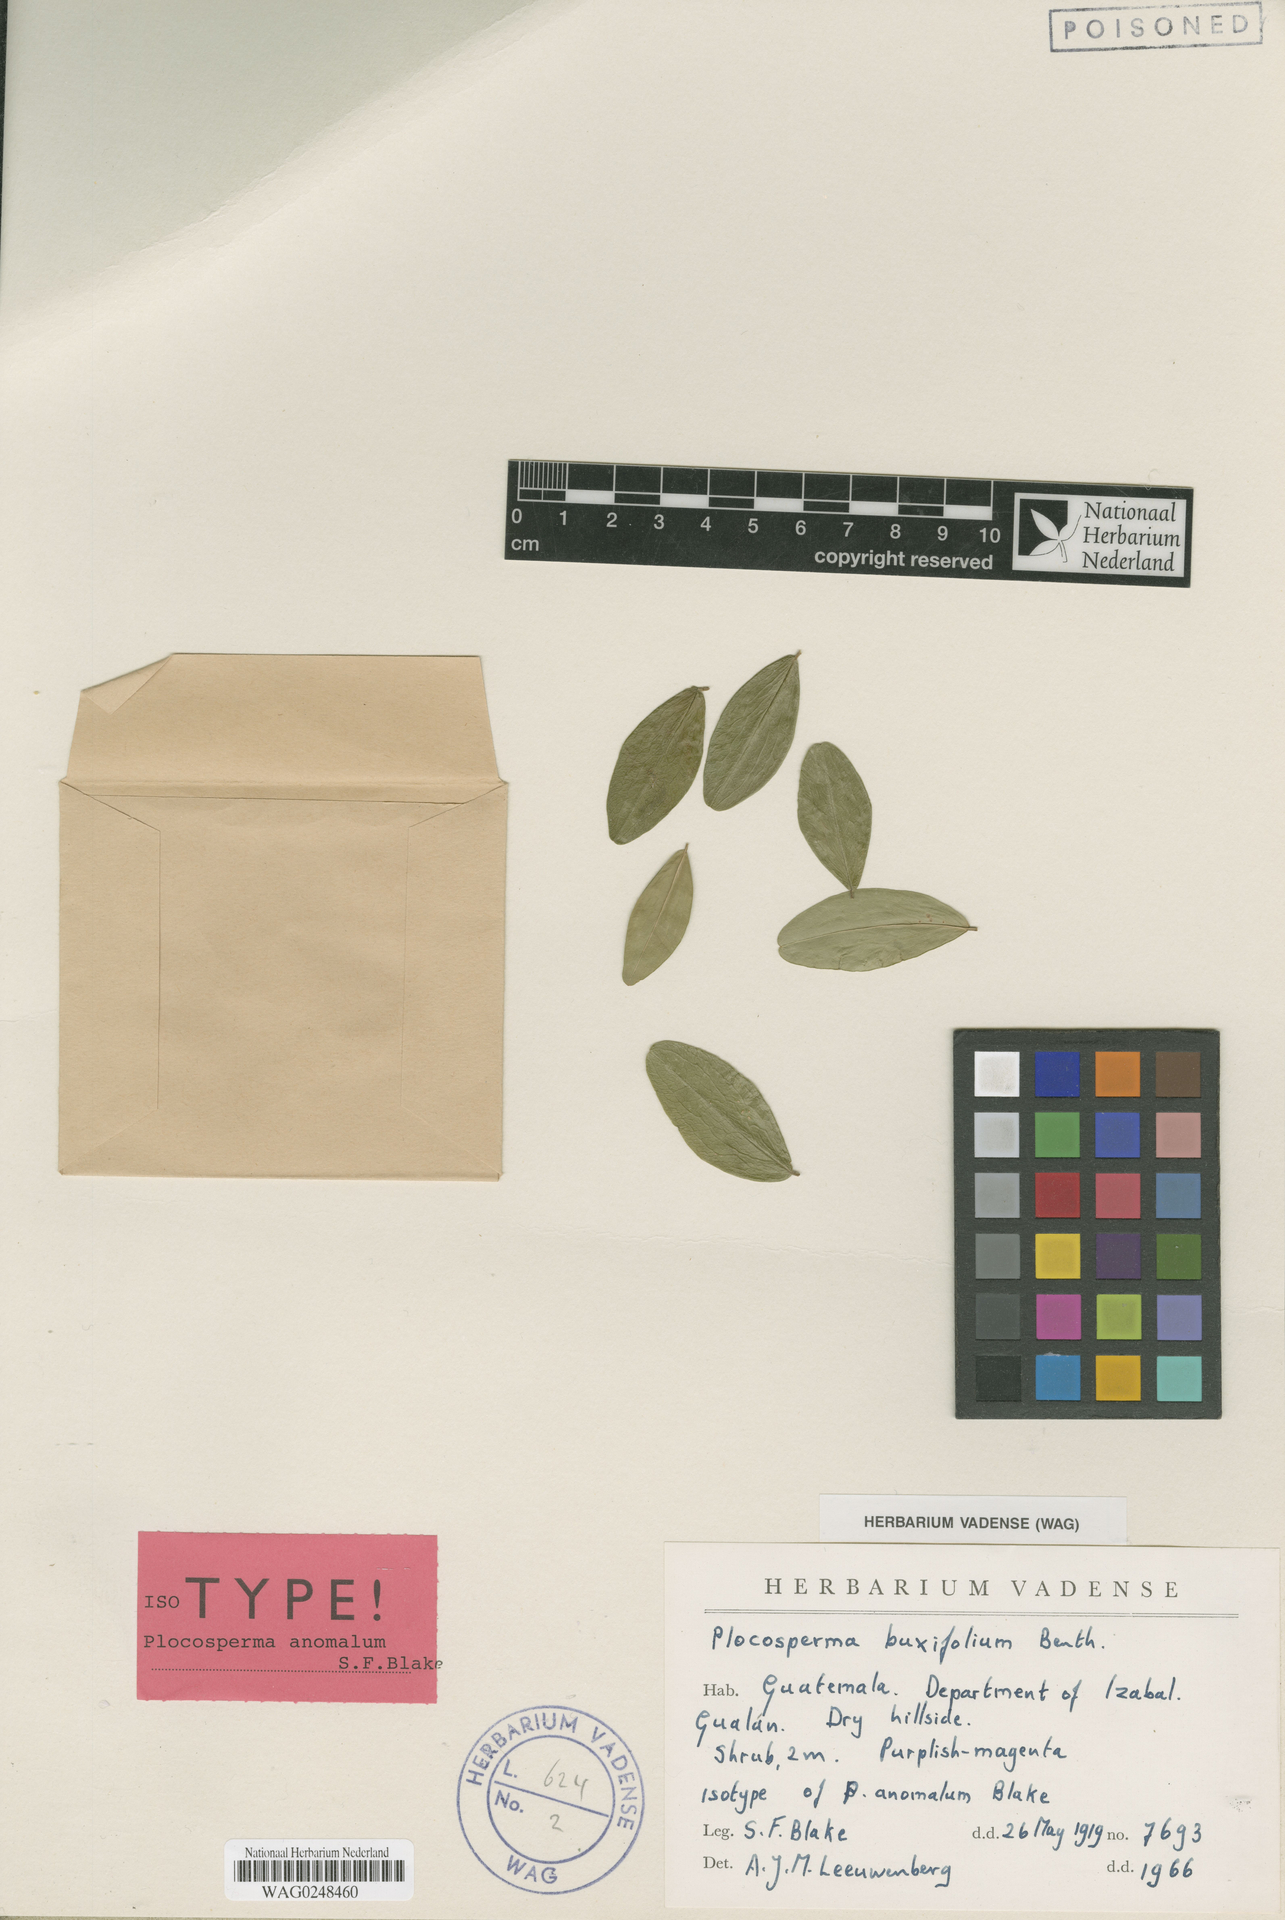 WAG0248460 | Plocosperma buxifolium Benth.